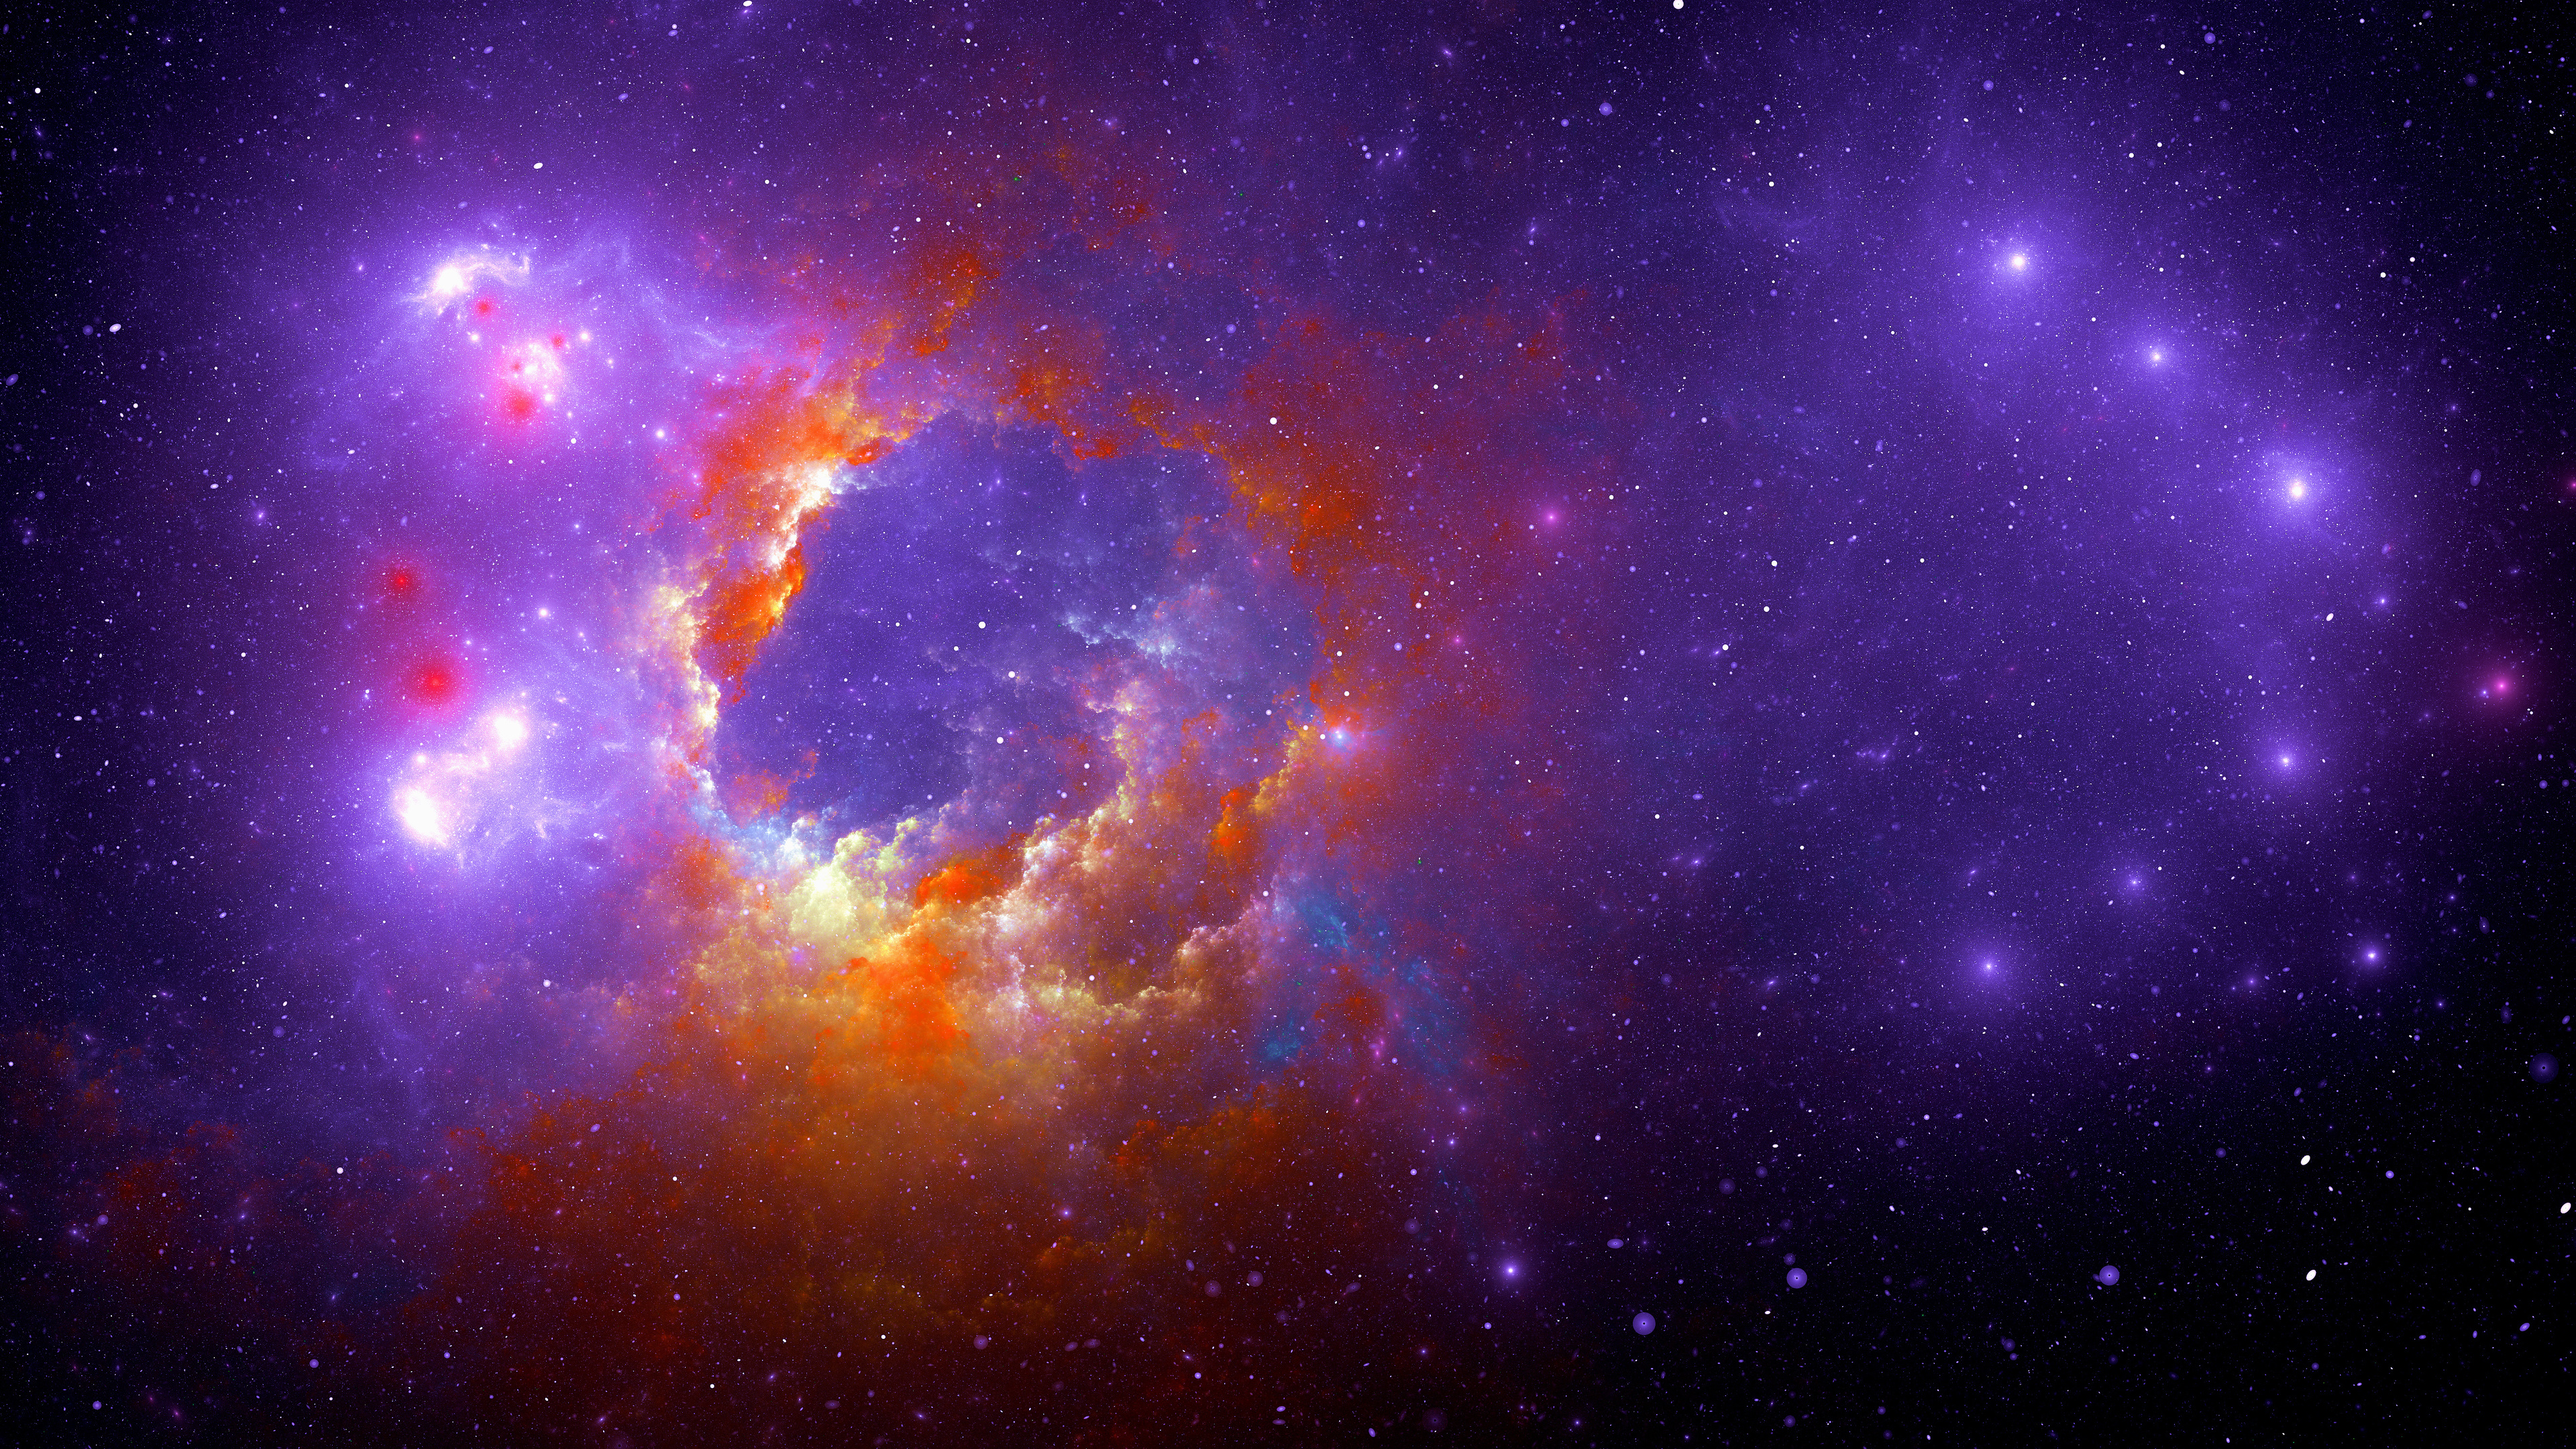 nebula digital art 4k 1546279212 - Nebula Digital Art 4k - nebula wallpapers, hd-wallpapers, digital universe wallpapers, digital art wallpapers, deviantart wallpapers, 5k wallpapers, 4k-wallpapers